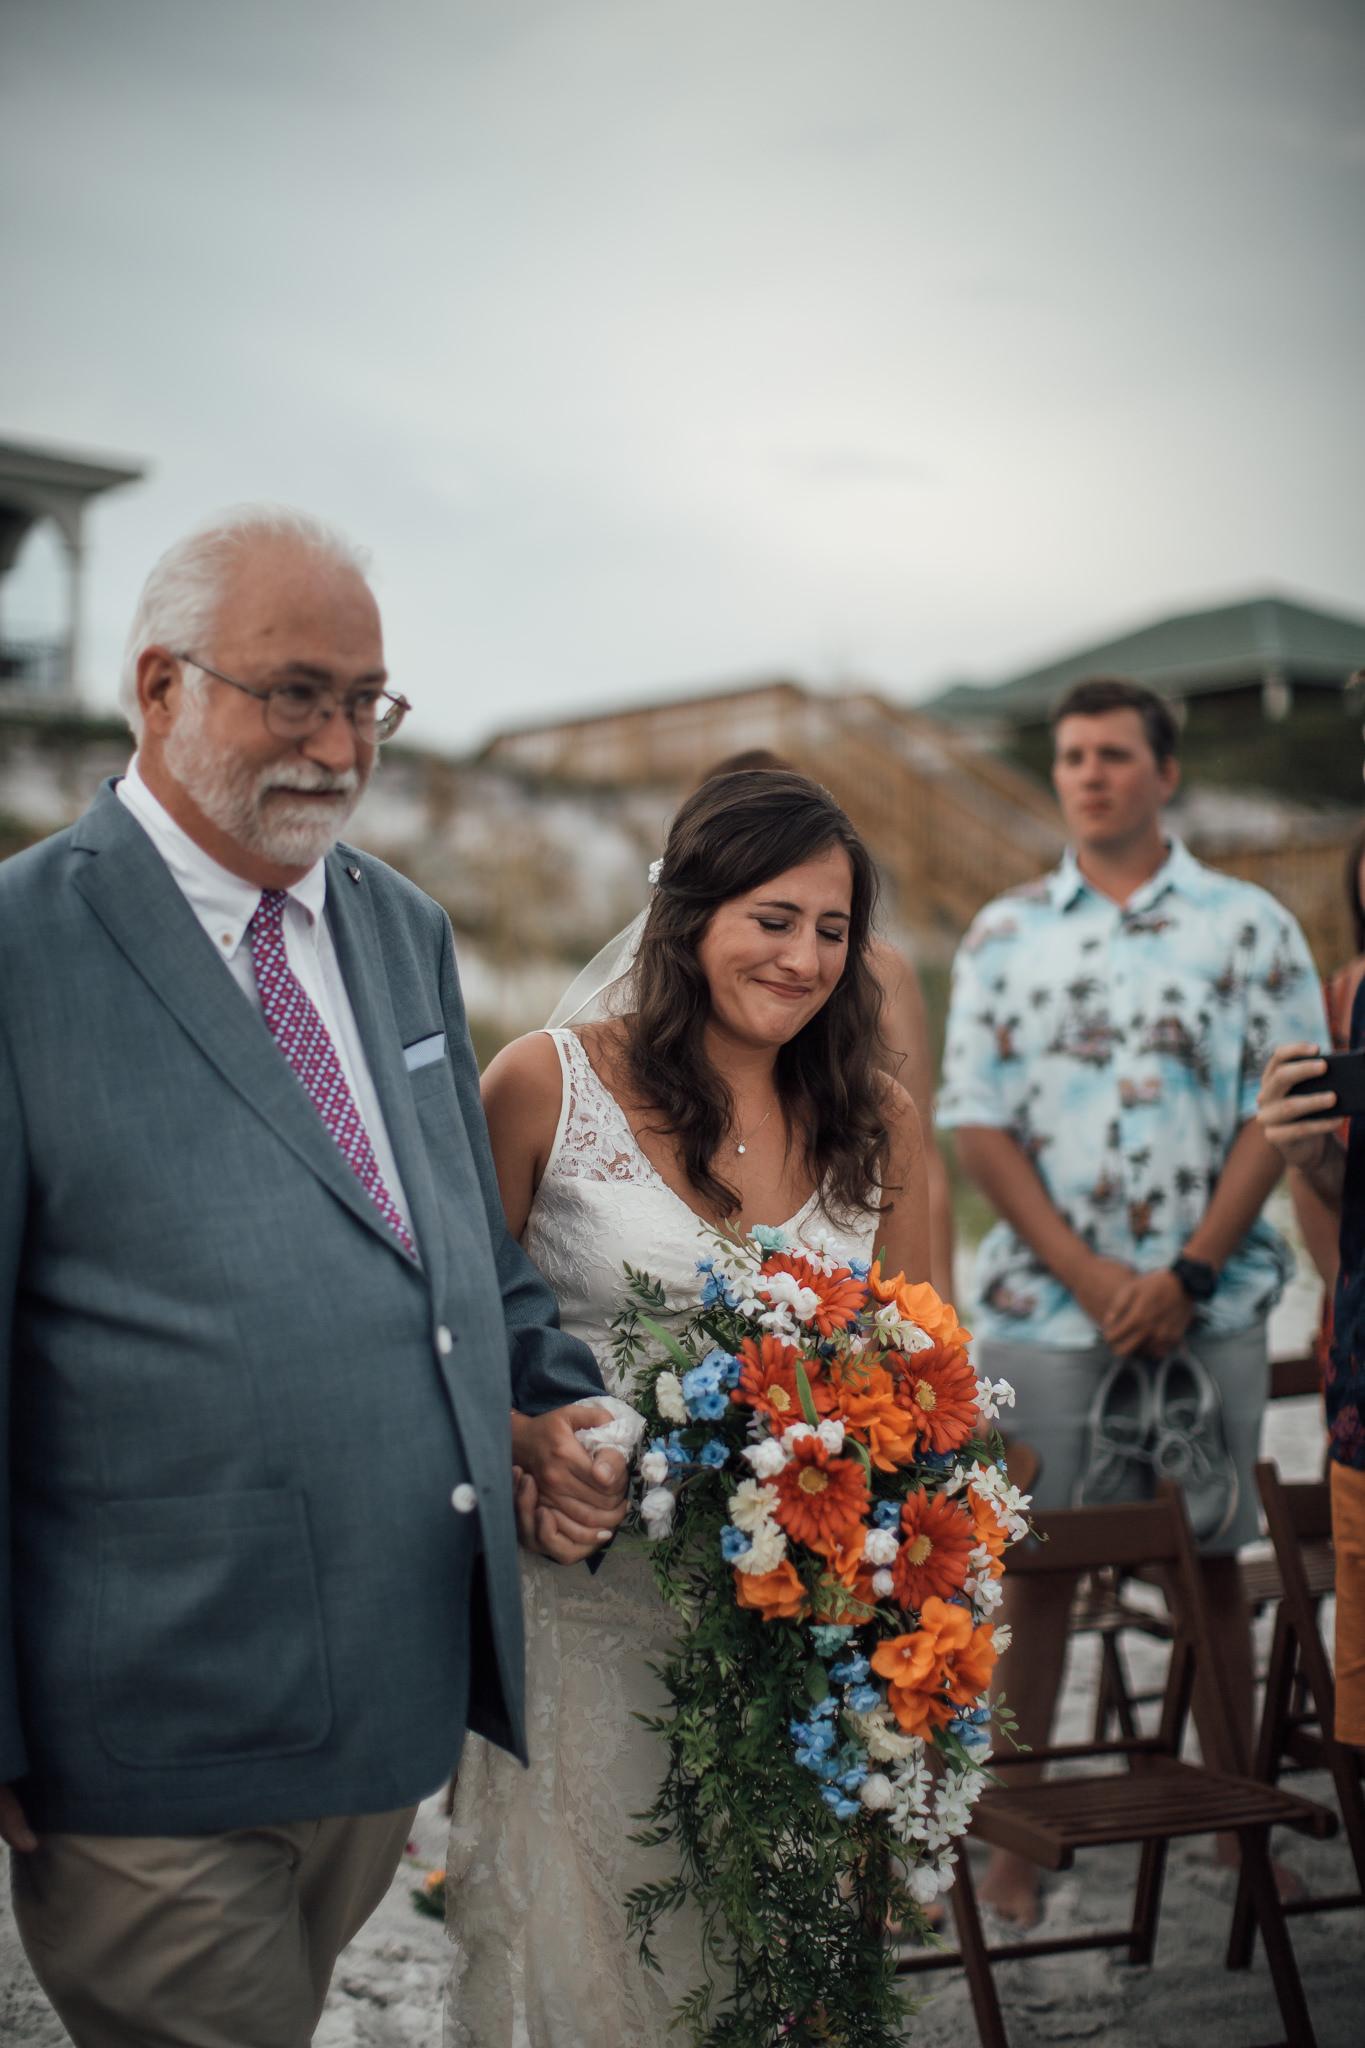 cassie-cook-photography-santa-rosa-beach-wedding-farrar-wedding-62.jpg